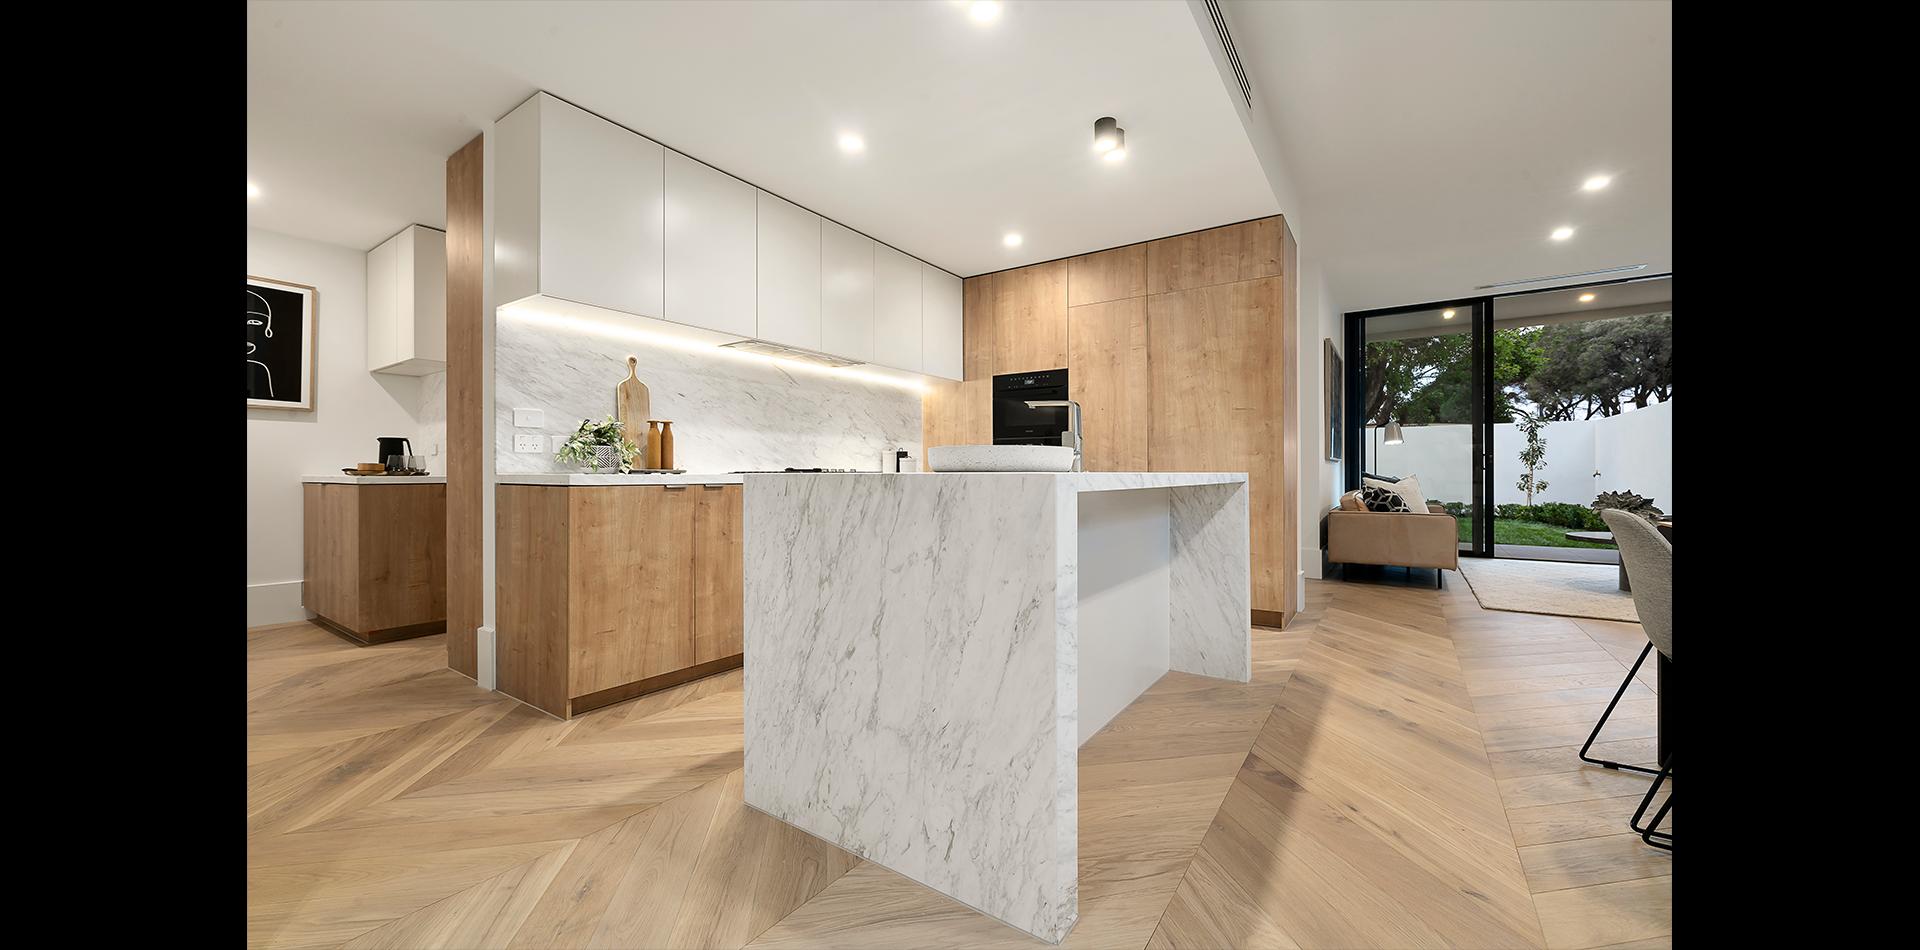 22 carr st brighton lane - kitchen